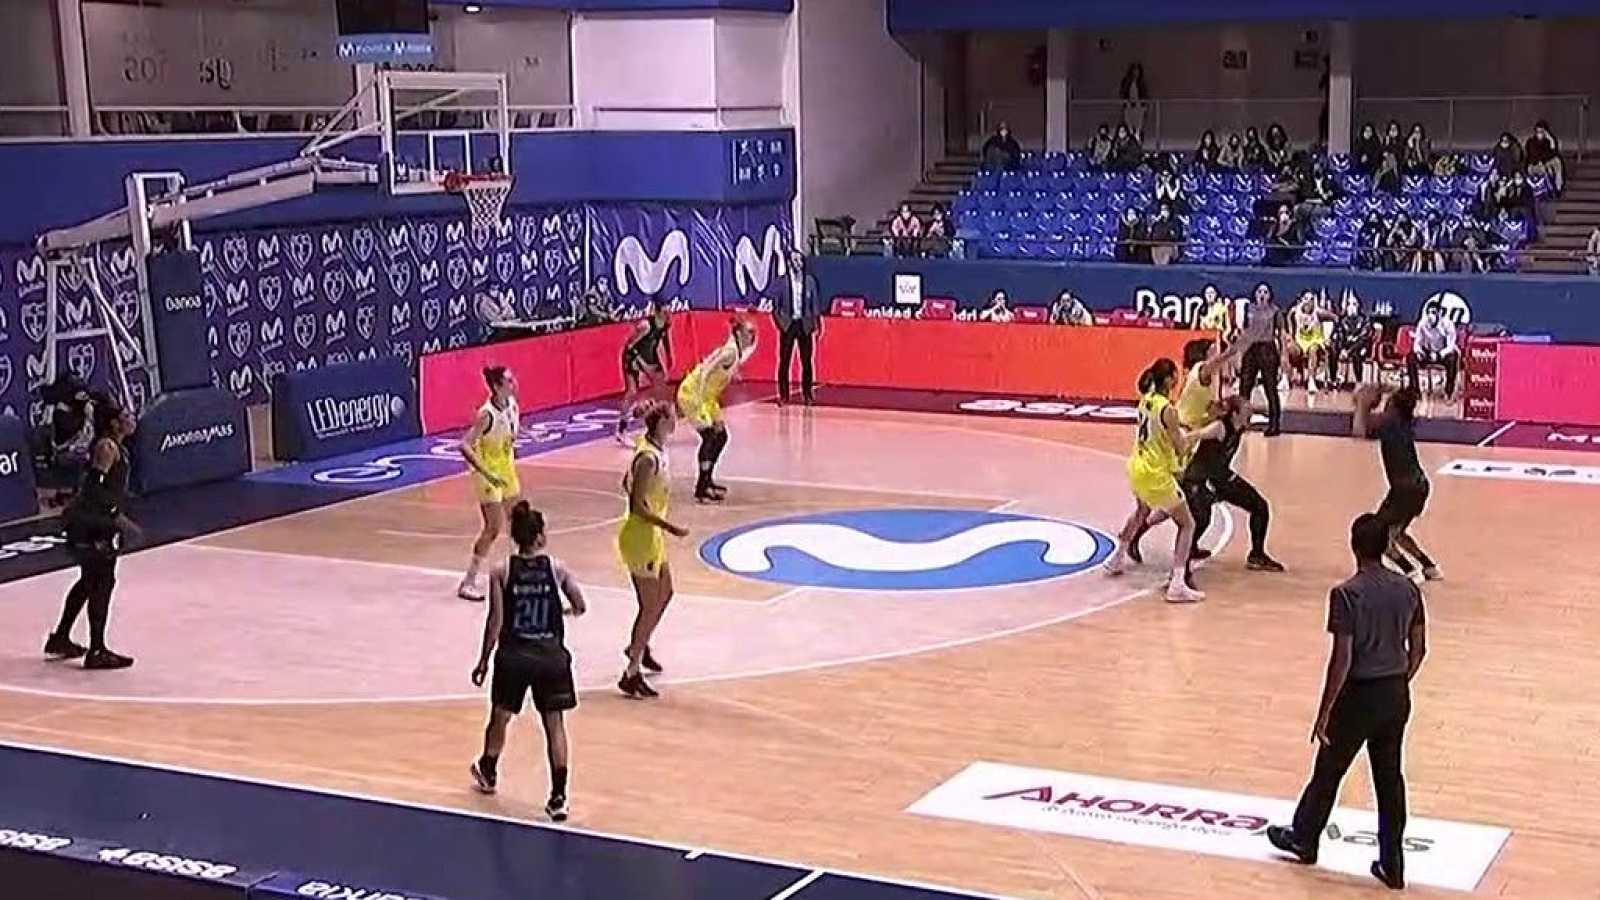 Baloncesto - Liga femenina Endesa. 8ª jornada: Movistar Estudiantes - Cadí La Seu - ver ahora